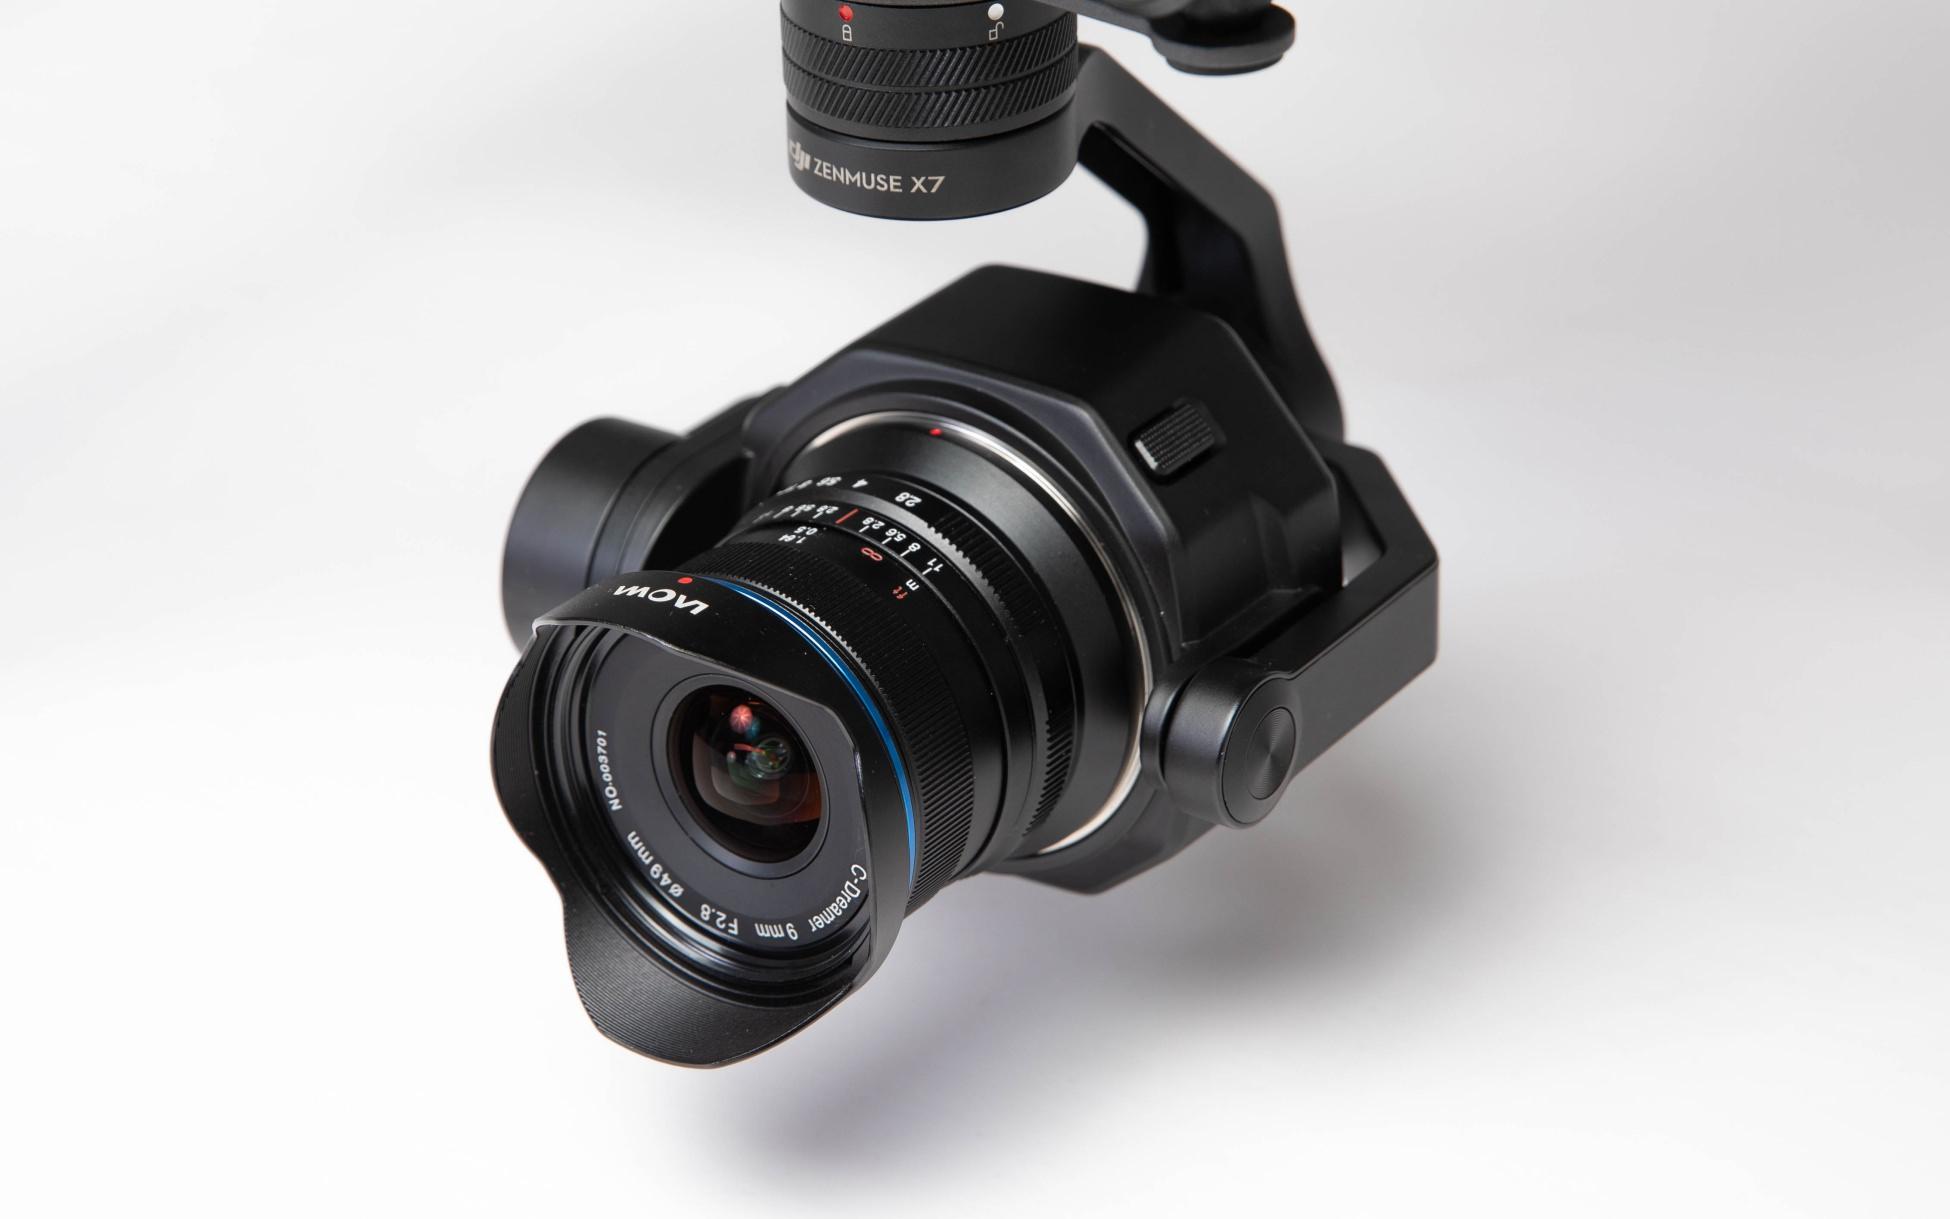 Venus Optics Laowa 9mm f/2.8 Zero-D lens for the Zenmuse X7